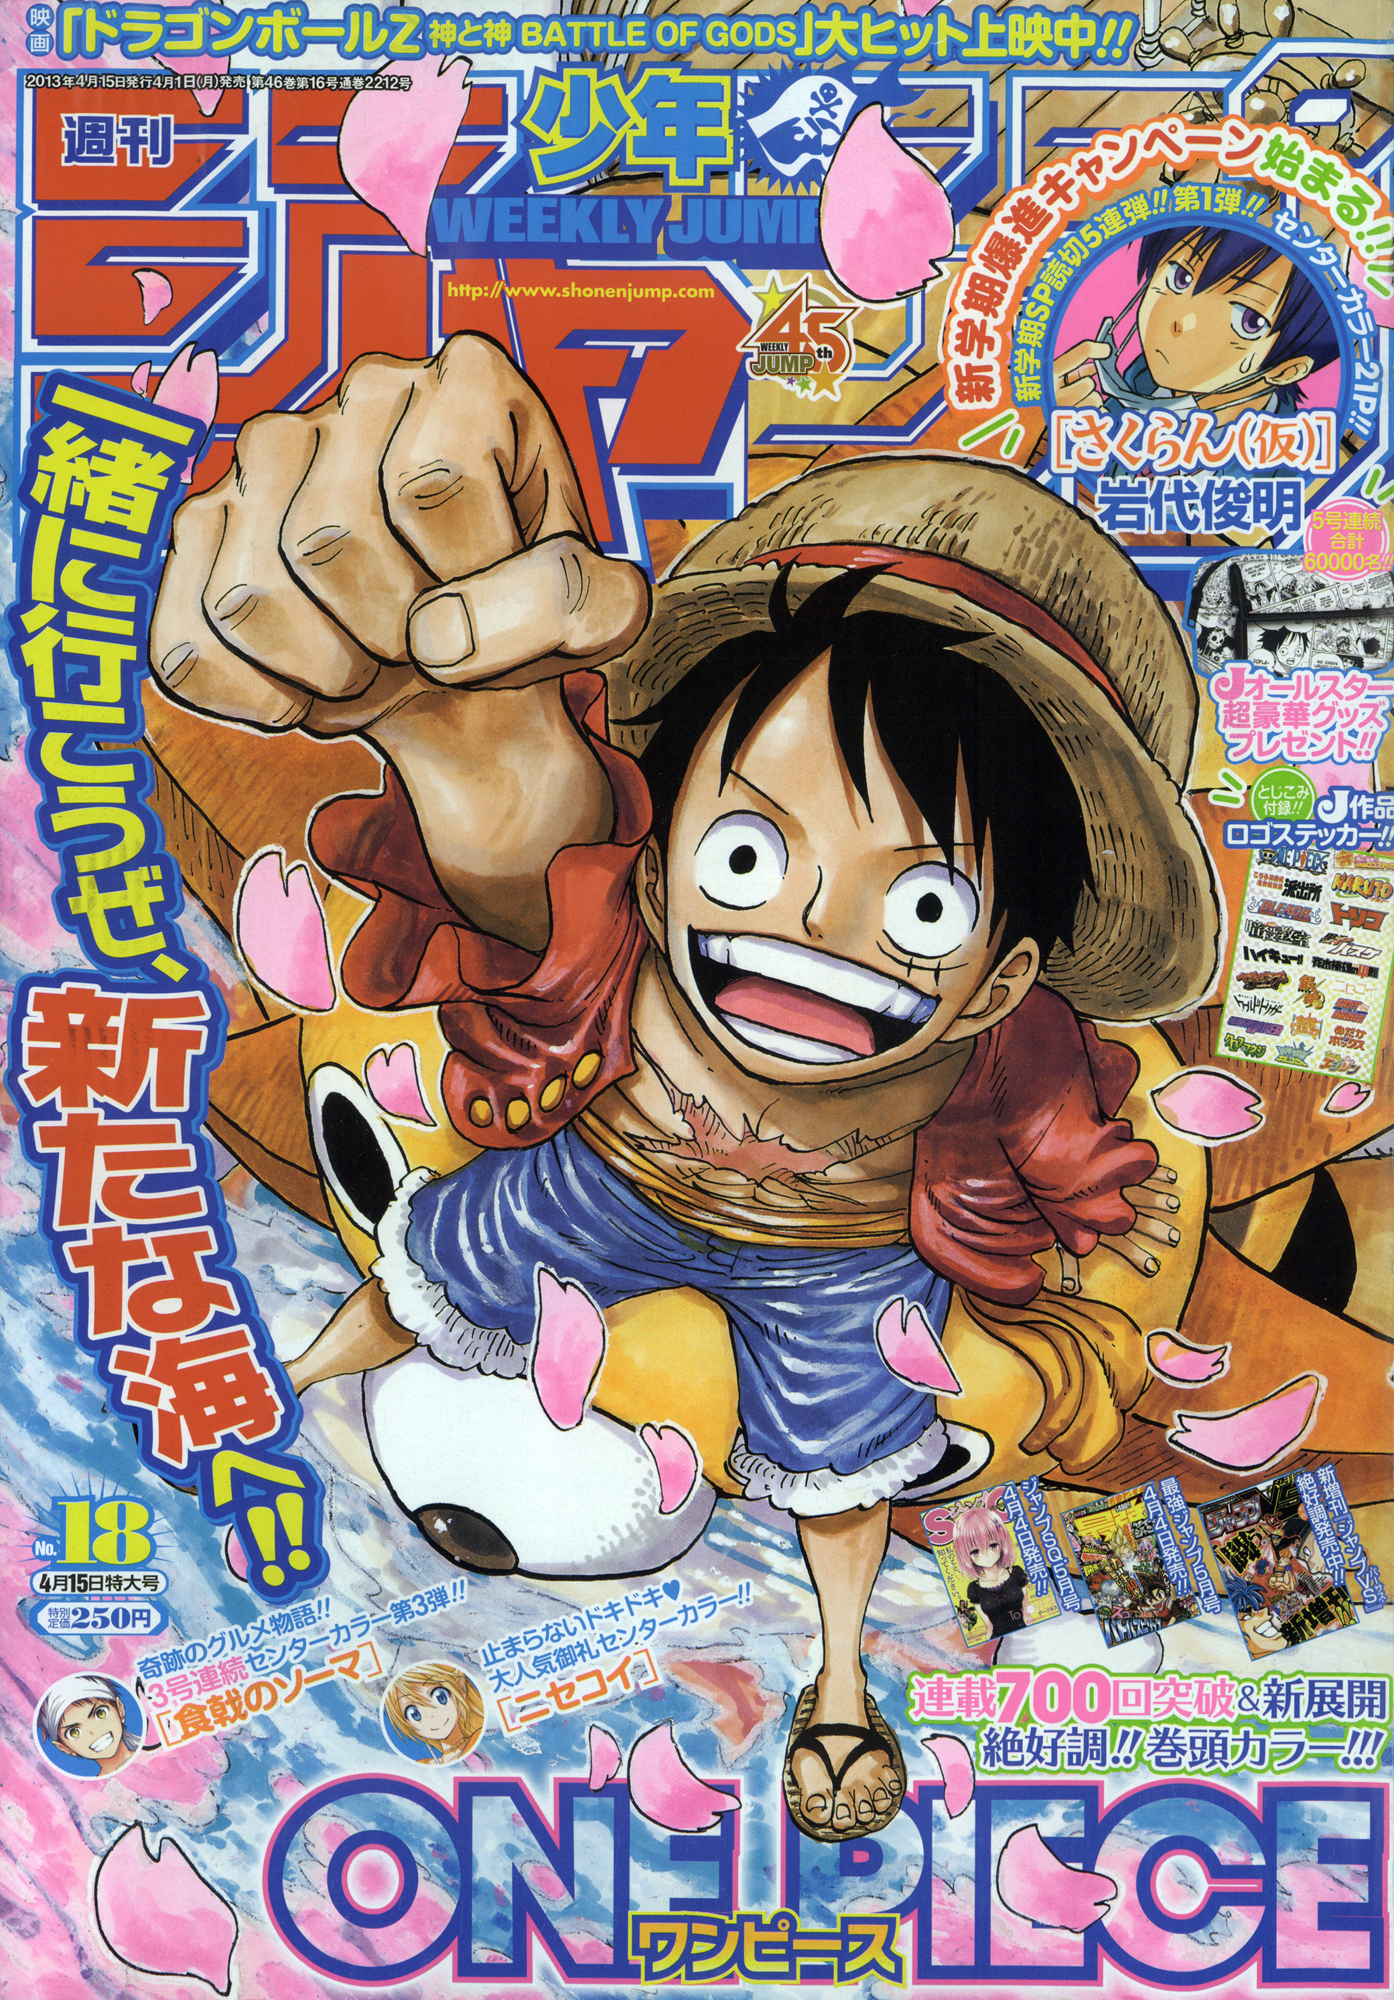 Monkey D. Luffy - ONE PIECE   page 9 of 37 - Zerochan Anime Image Board